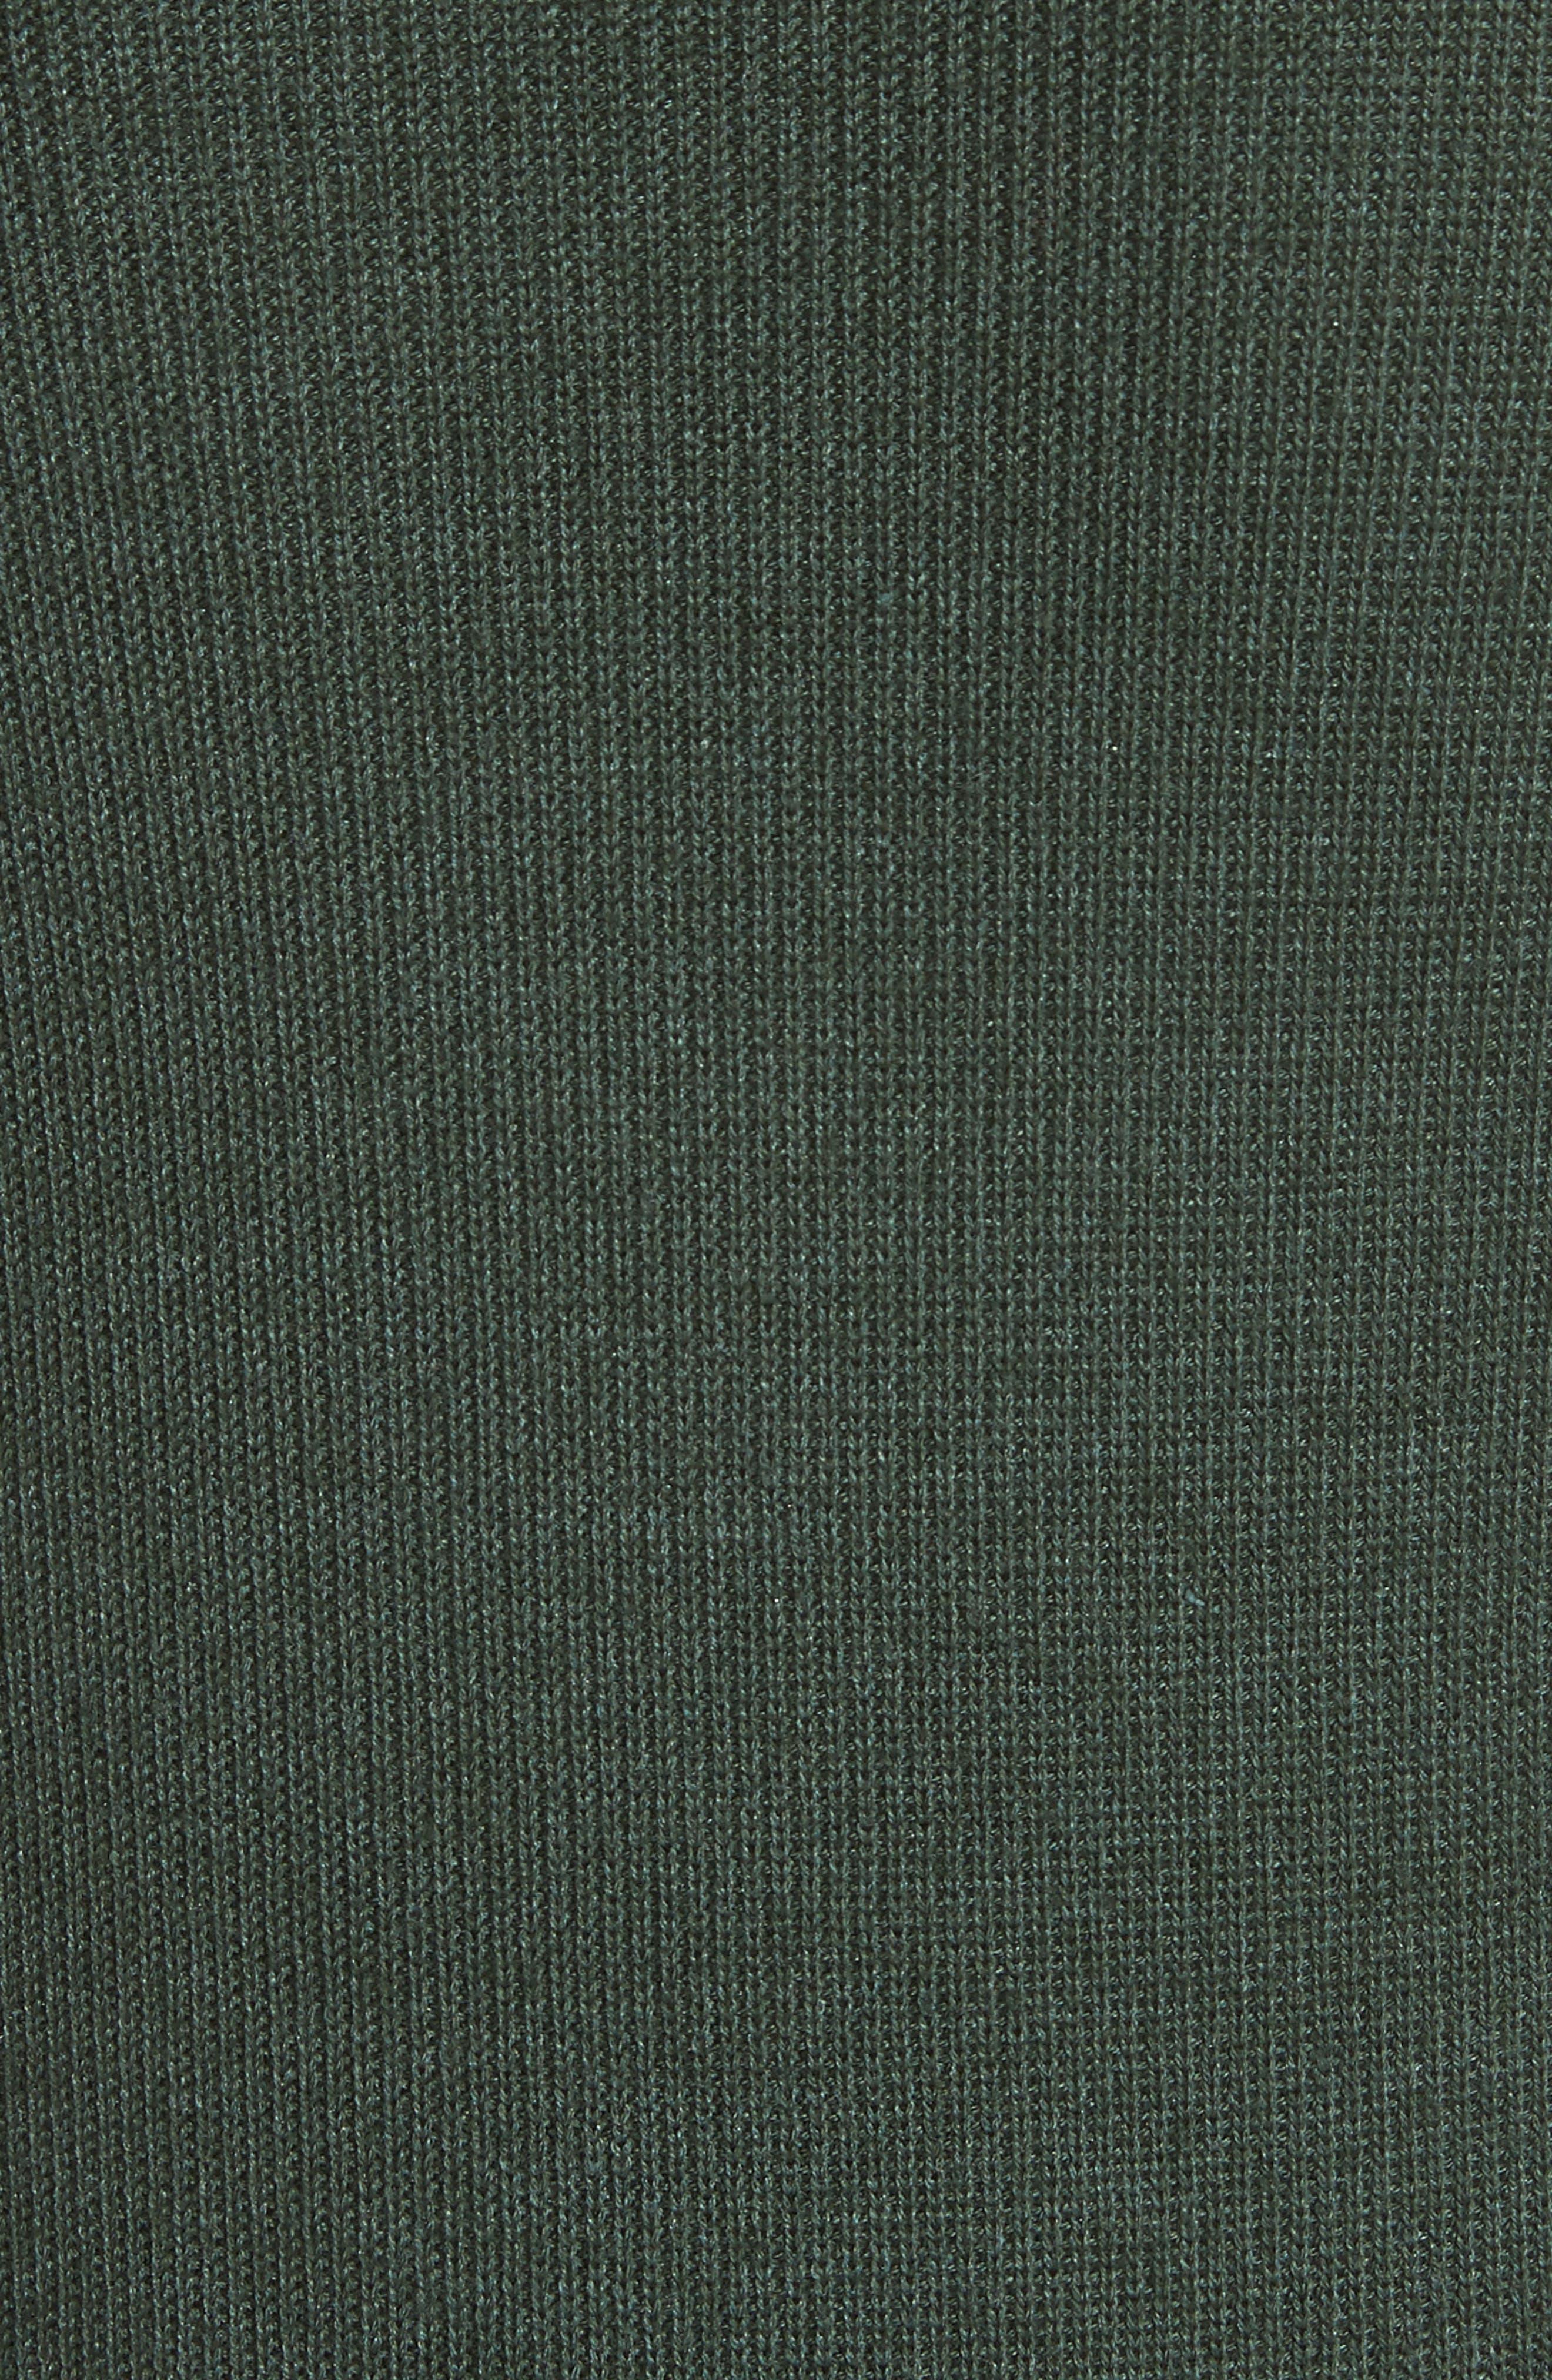 Button Seam Silk & Merino Wool Sweater,                             Alternate thumbnail 5, color,                             368